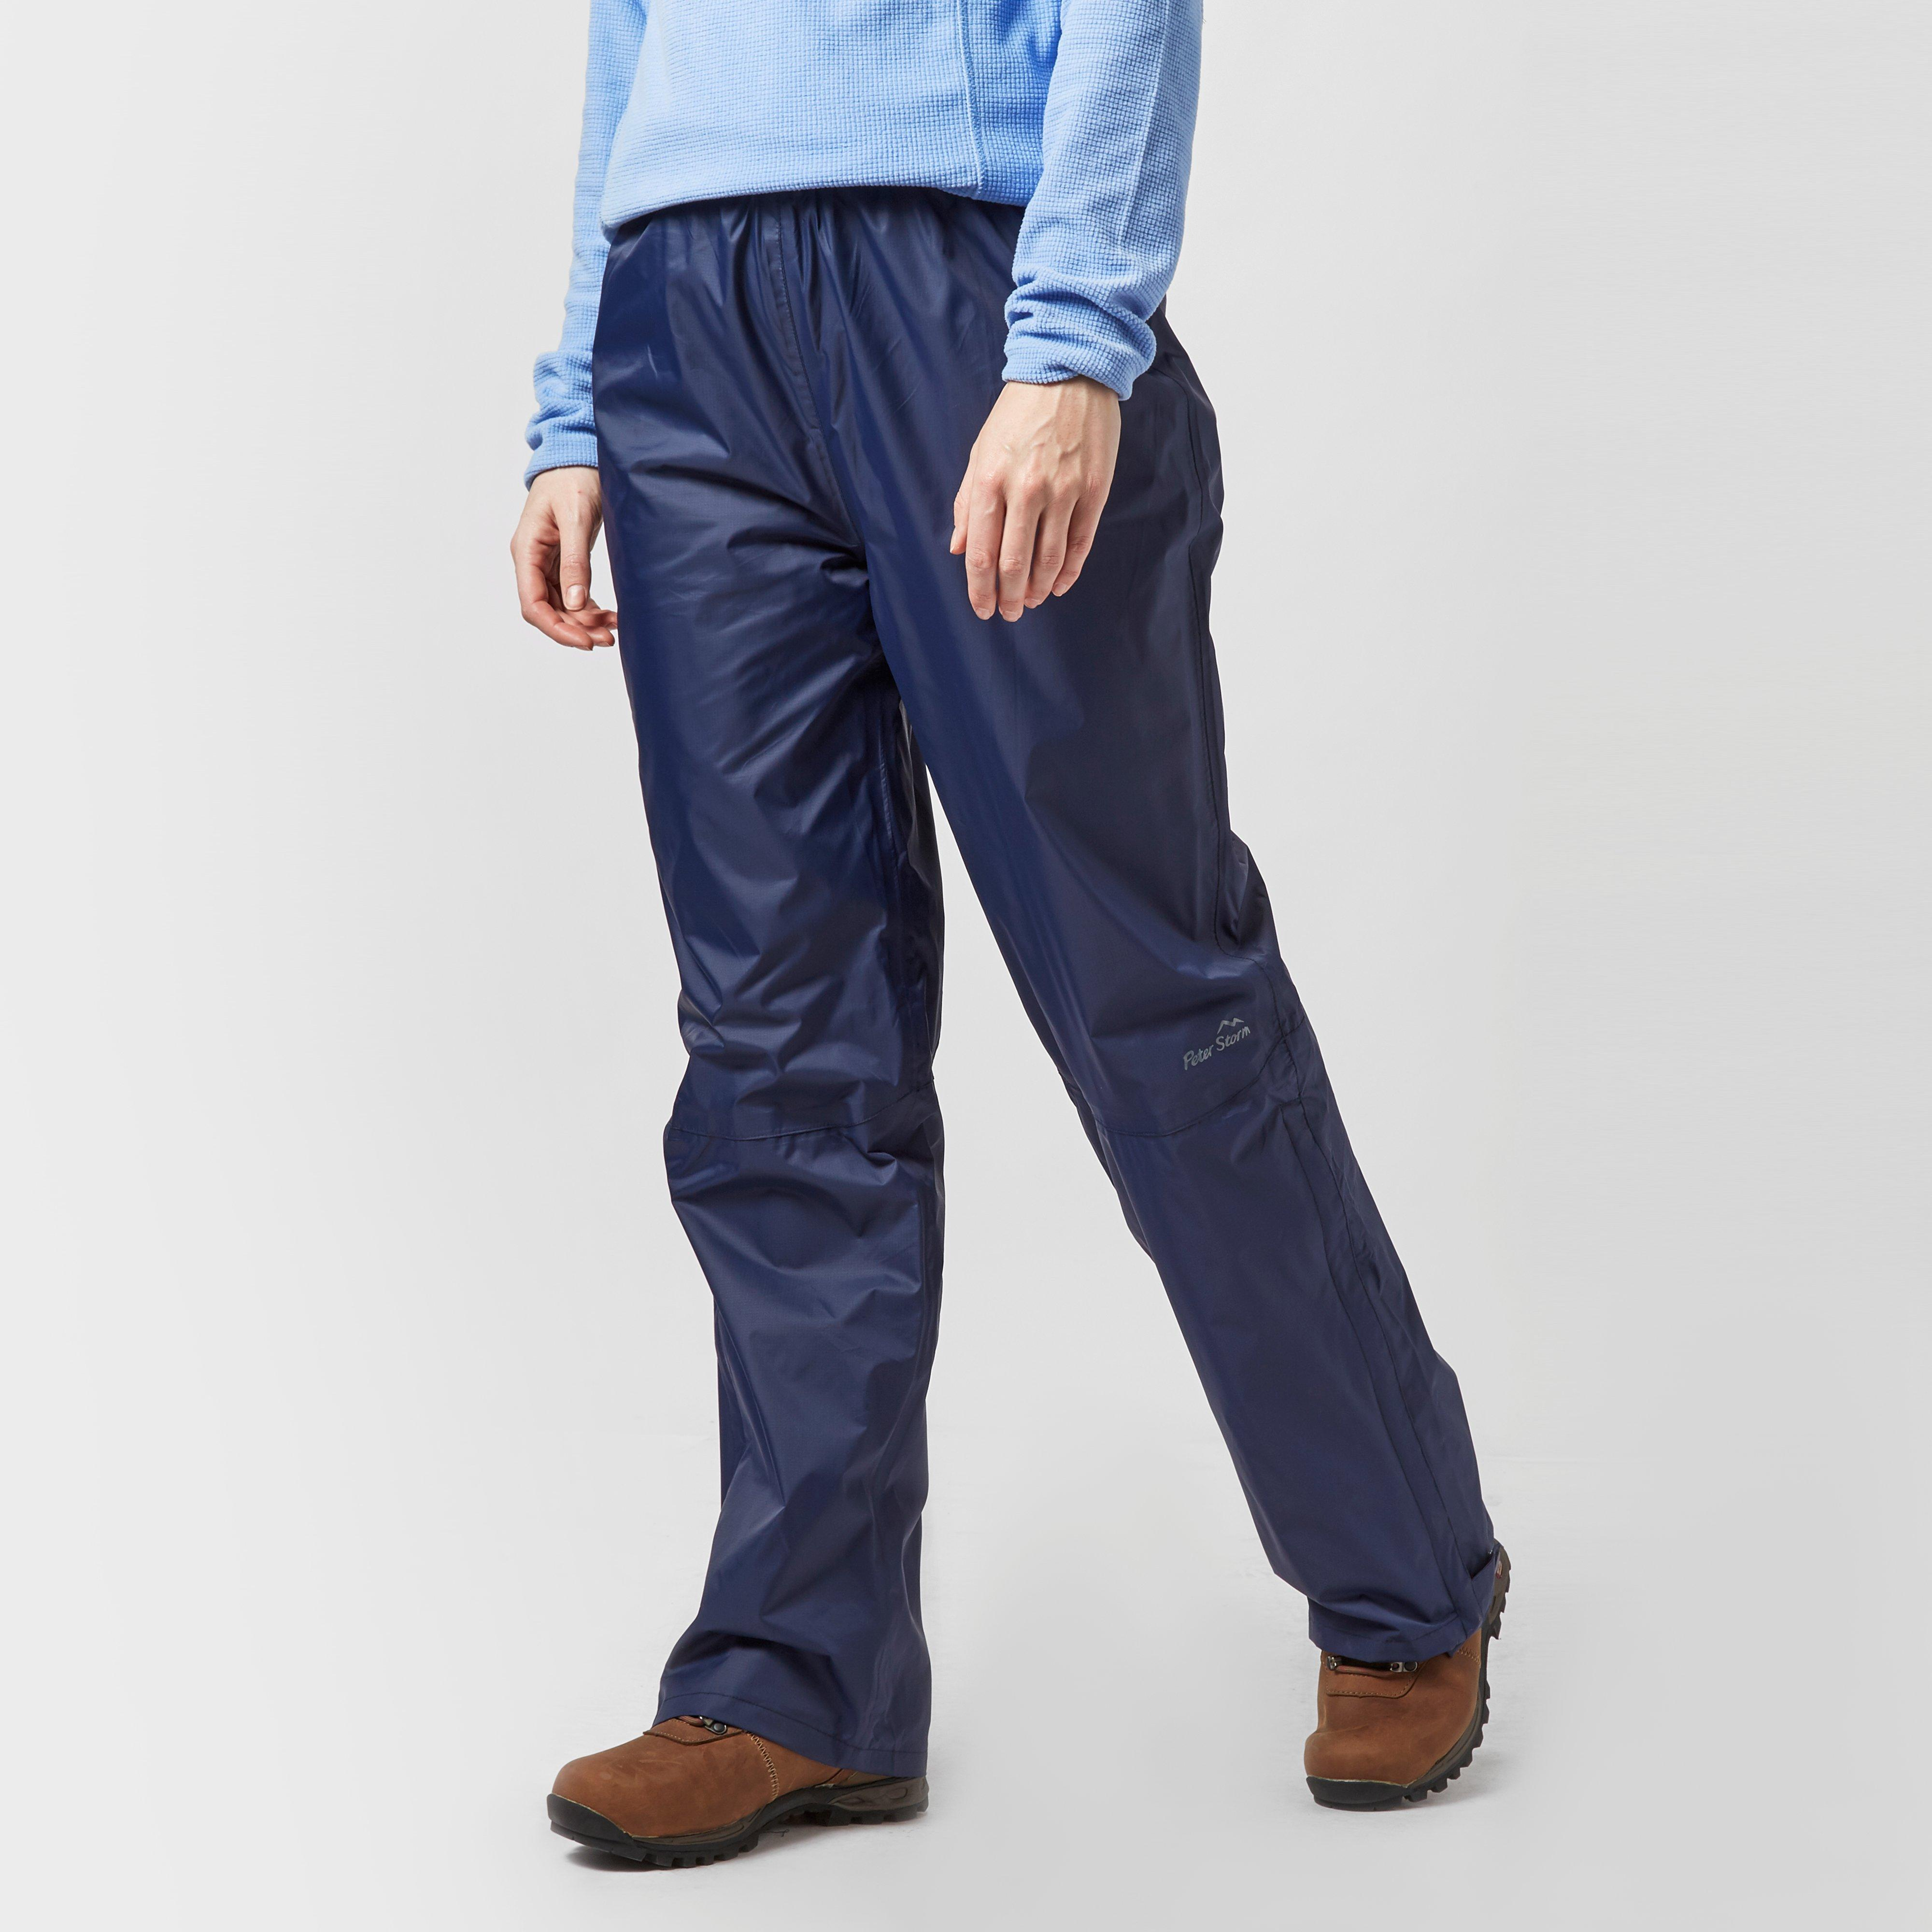 Peter Storm Peter Storm womens Tempest Waterproof Trousers - Navy, Navy